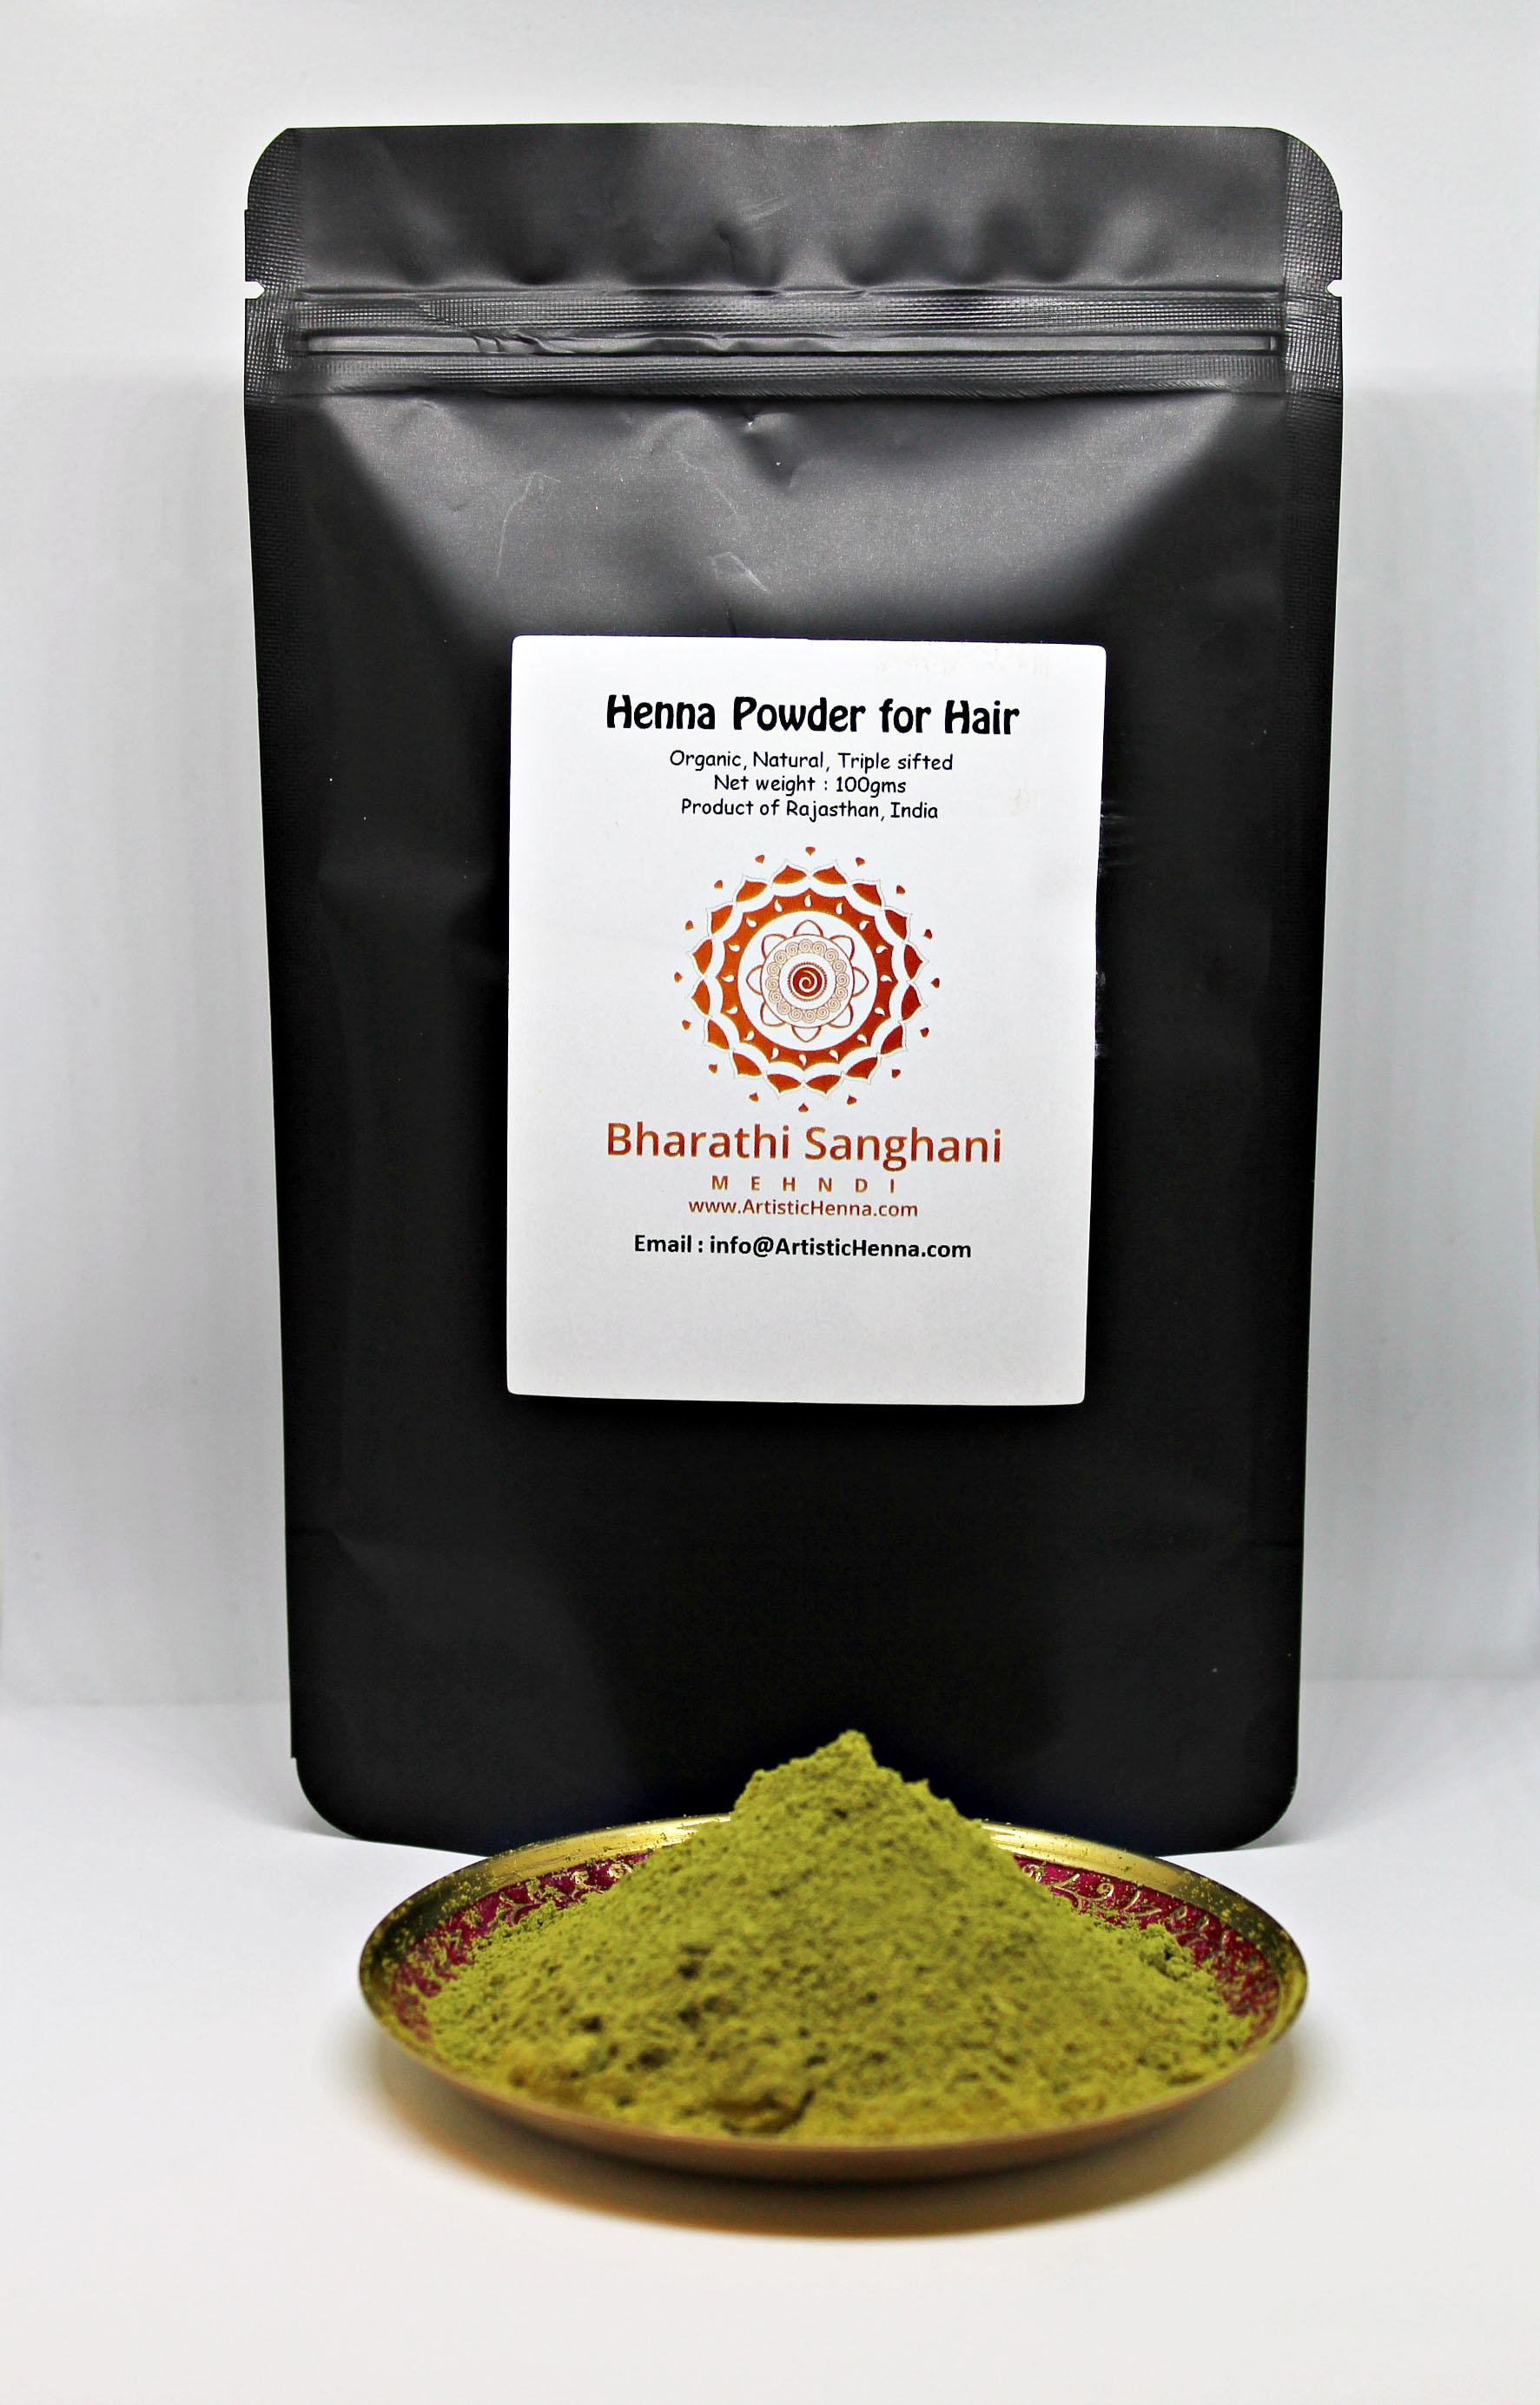 Henna Powder: Henna Powder For Hair 100gms